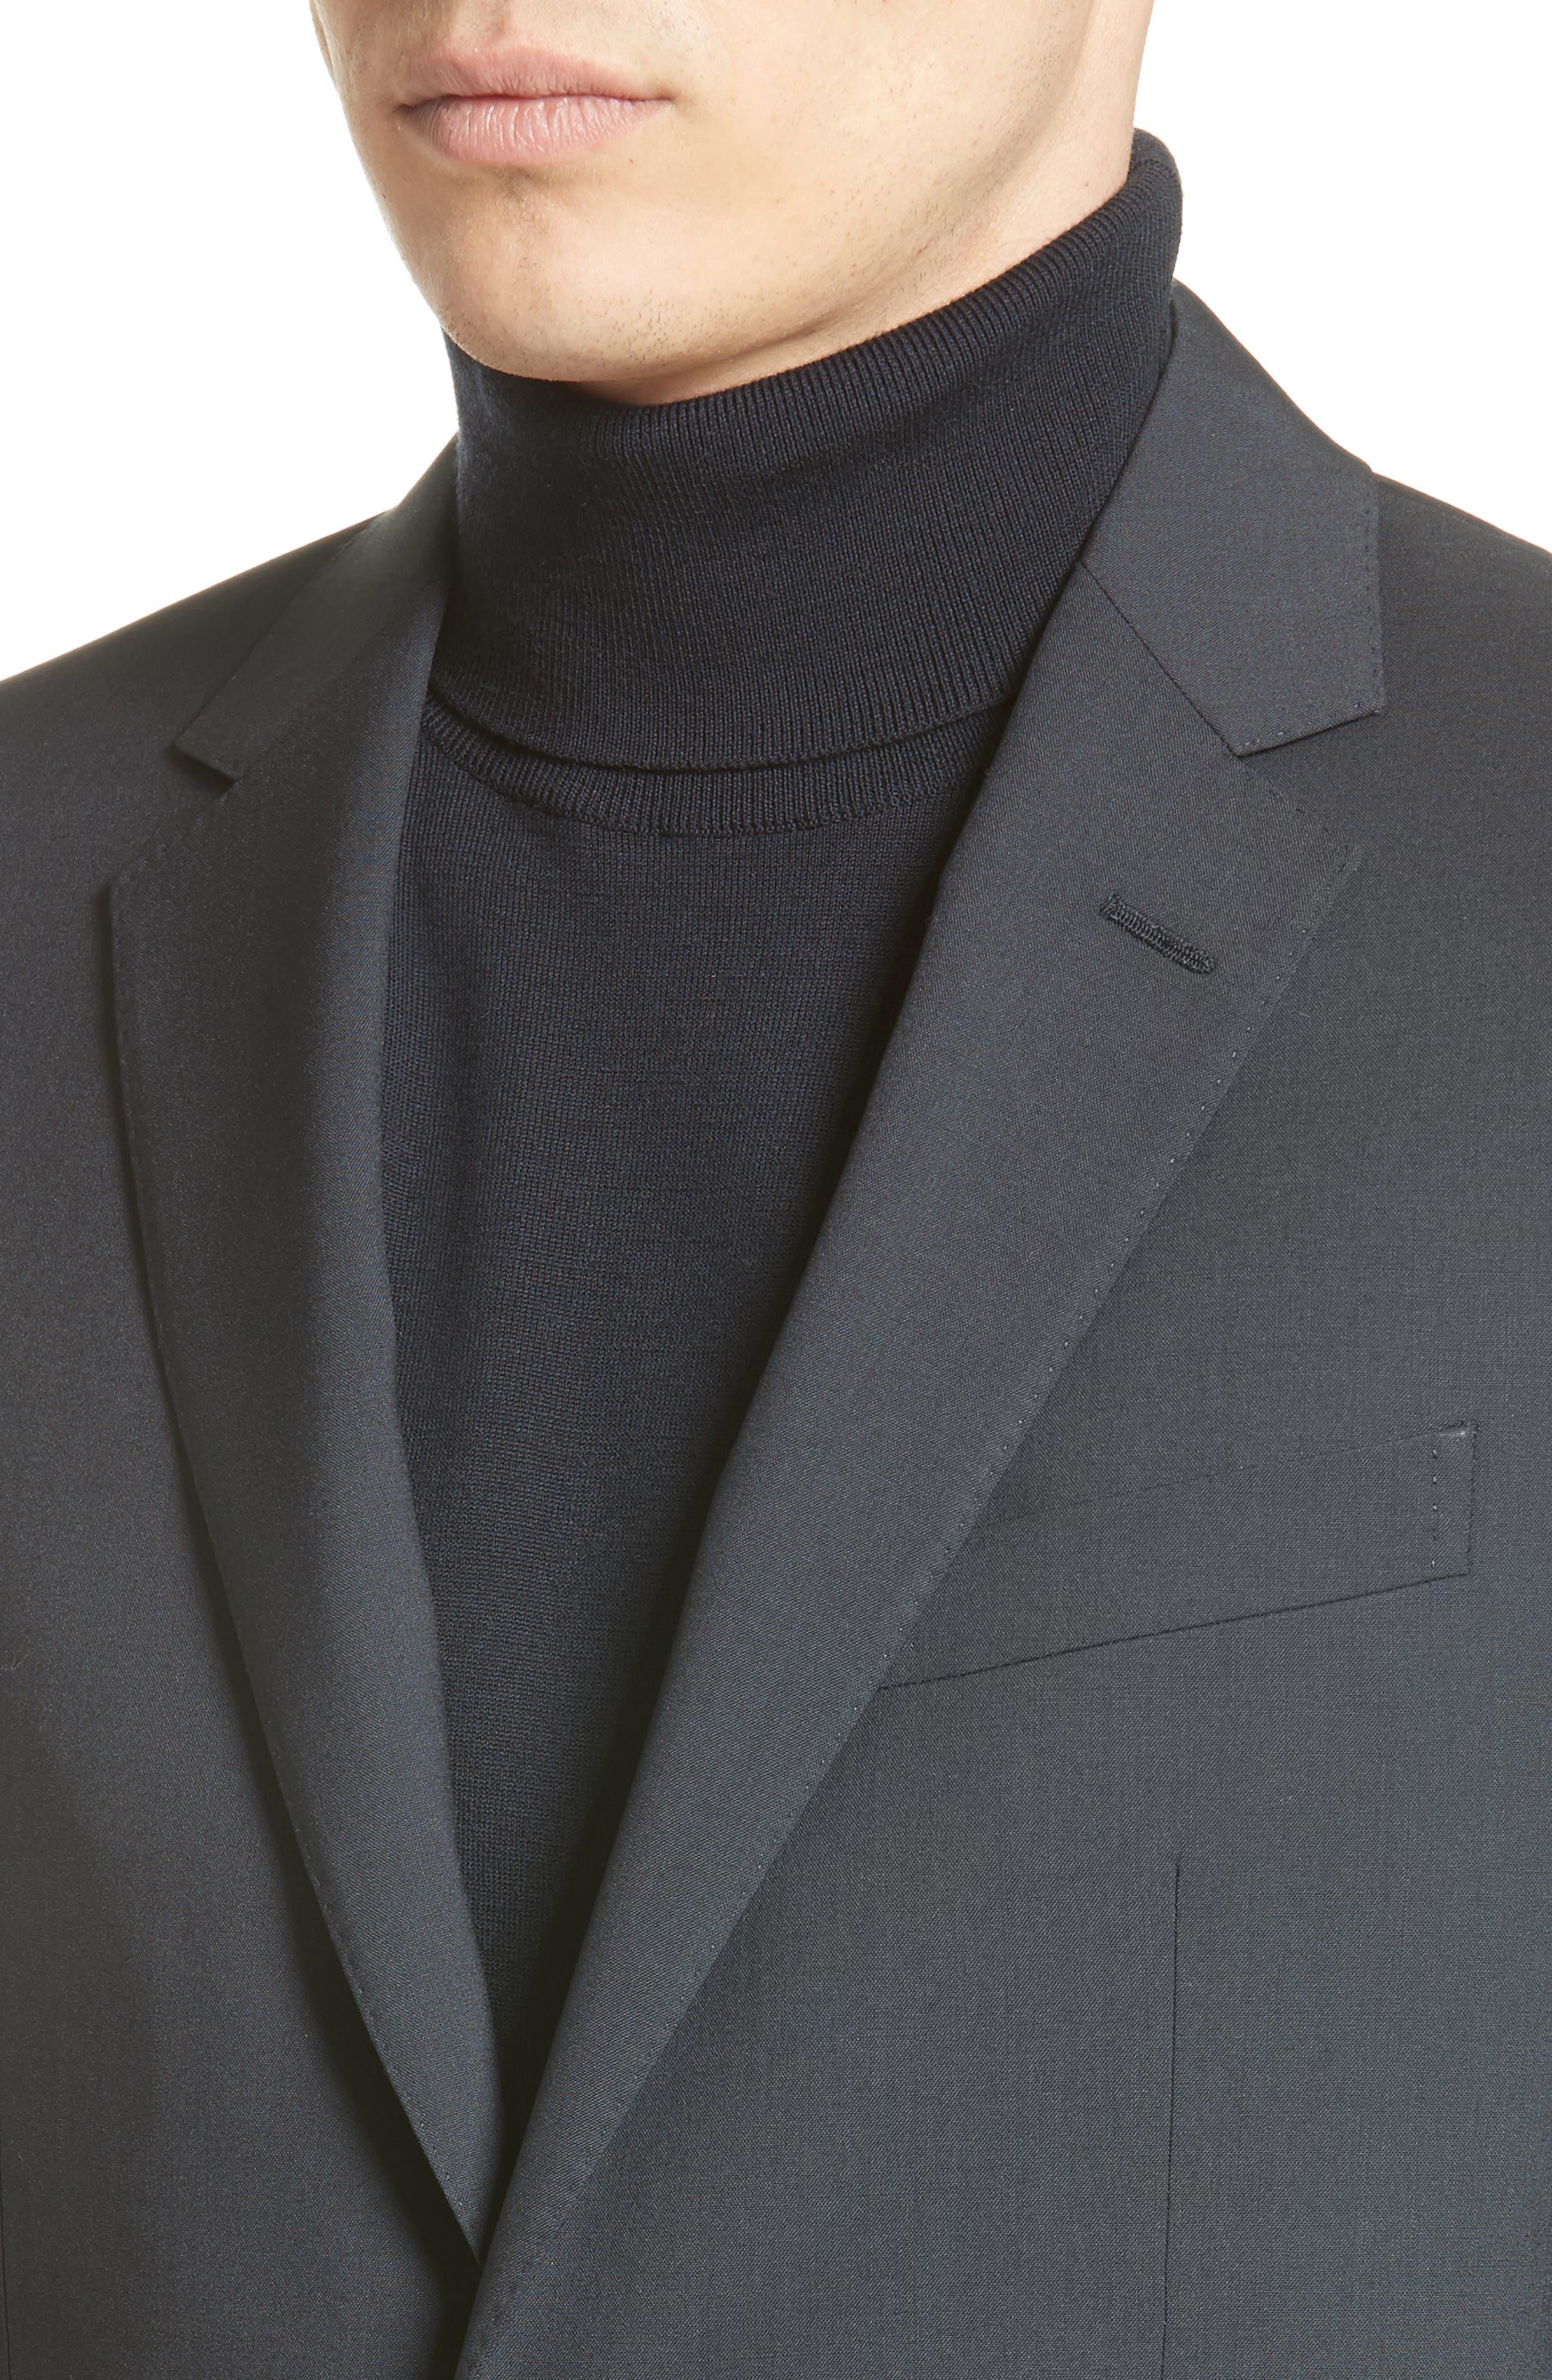 Tropical Wool Suit Jacket,                             Alternate thumbnail 5, color,                             NAVY